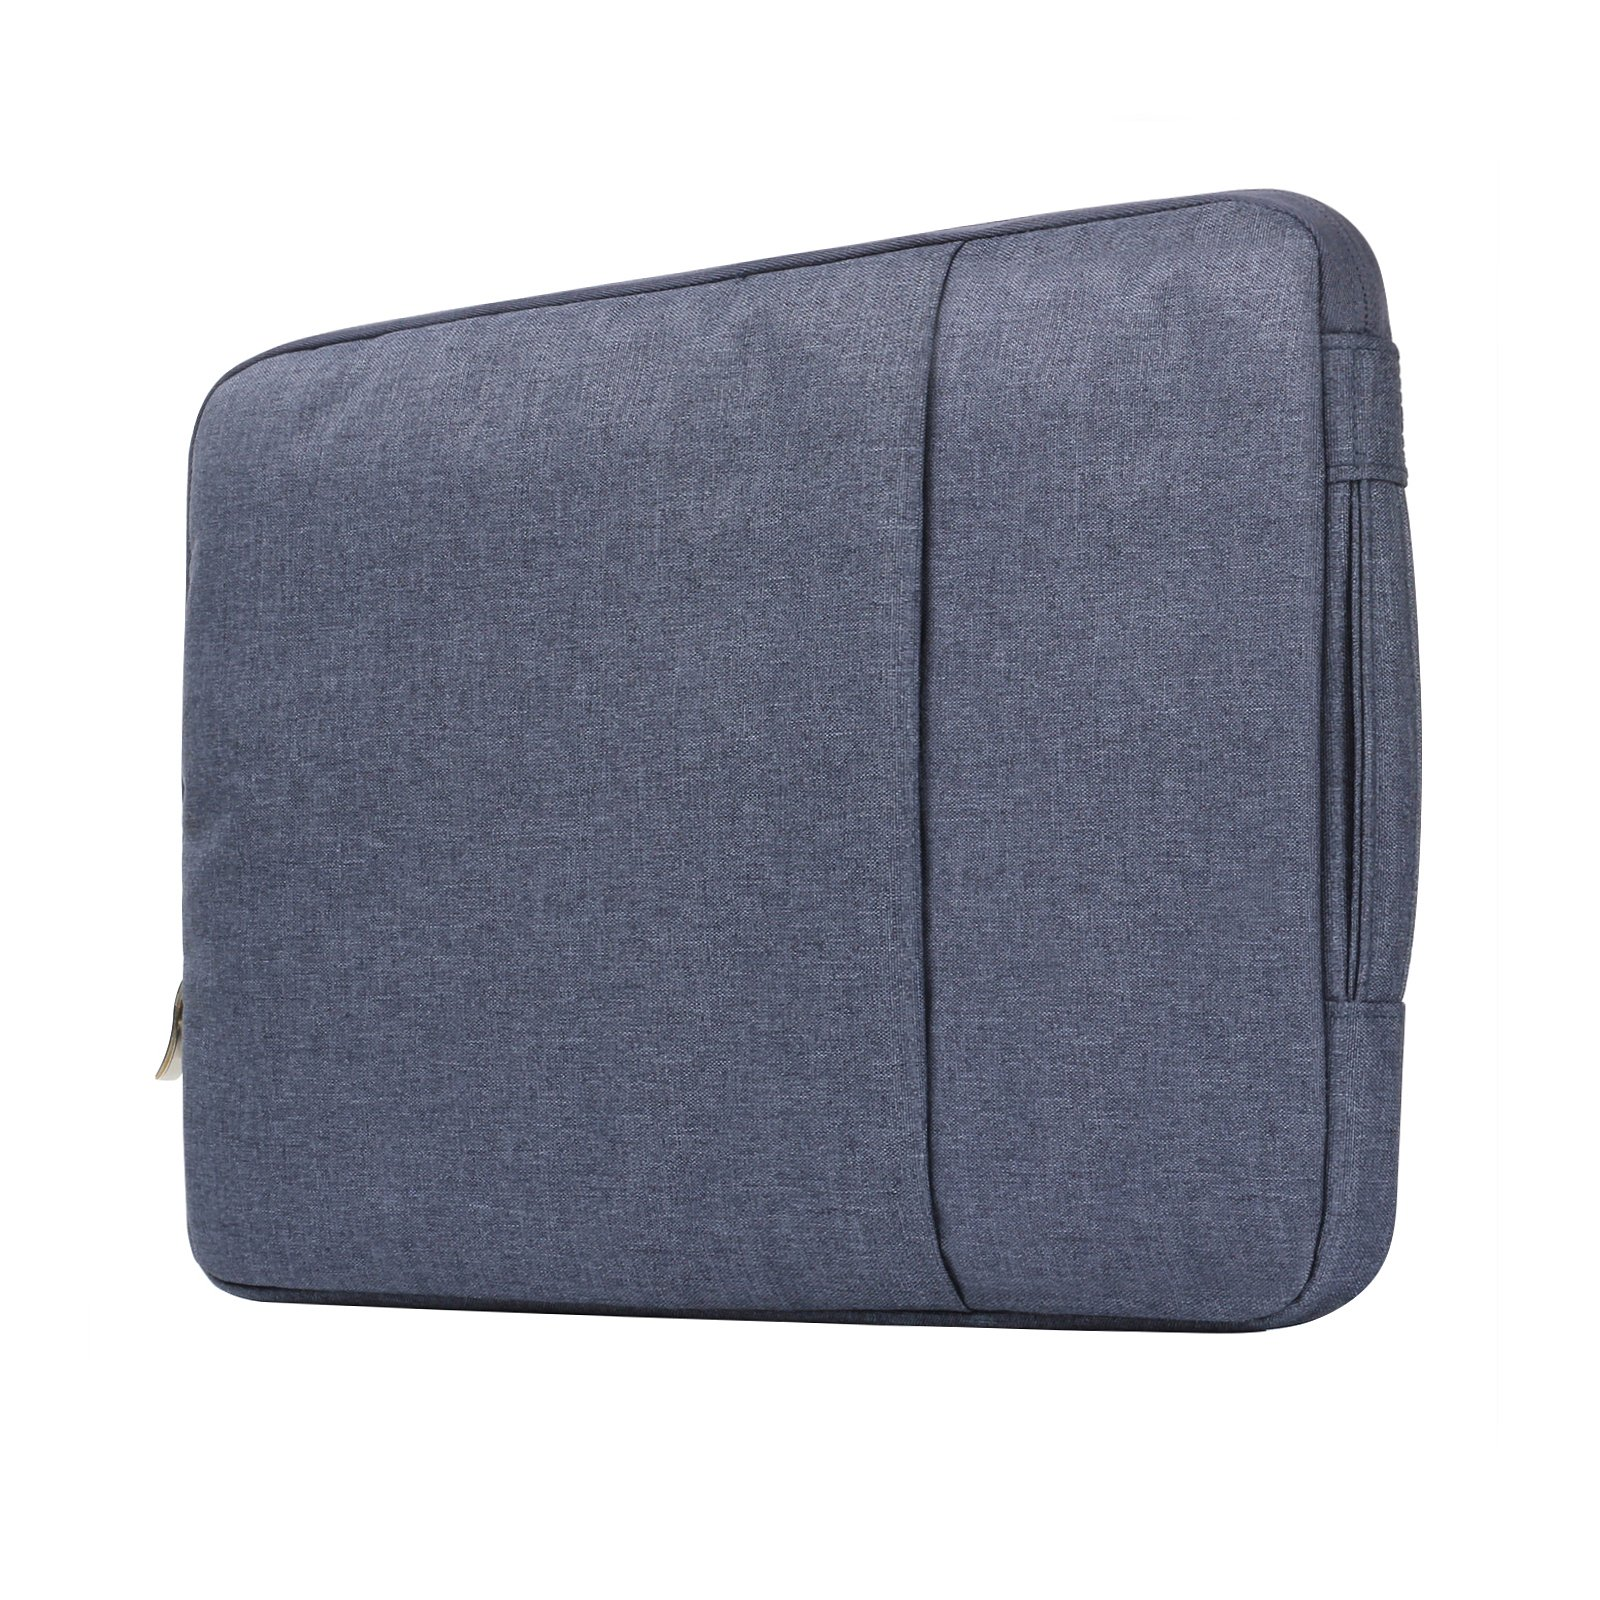 Macbook Air 13'' Travel Bag,Macbook Pro 13'' 2016 Sleeve Case,Anrain Laptop Protective Bag Pouch for MacBook Pro 13.3'' Retina Macbook Air 11'' 13'' 12.9'' iPad Pro Acer Dell HP Chromebook,Denim Blue